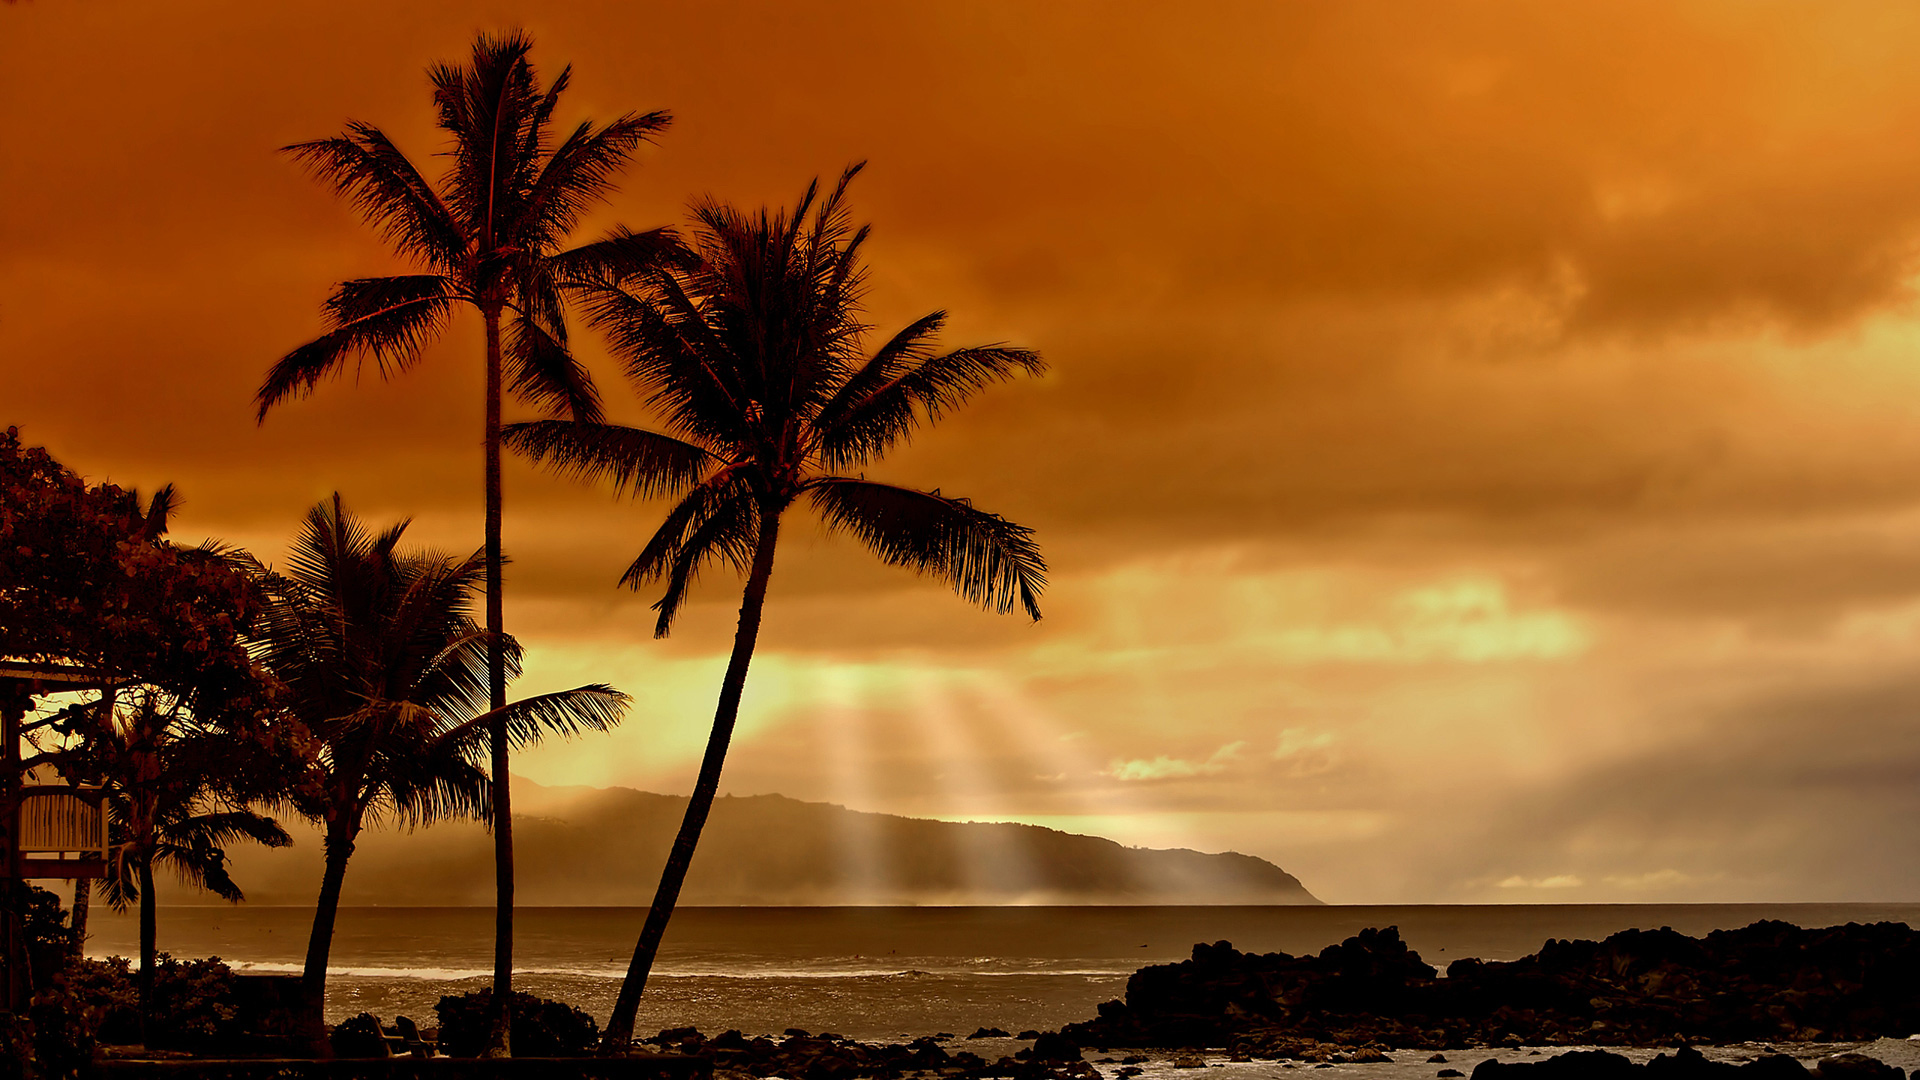 Beach Sunset With Palm Trees   Home Design Ideas Interior Design 1920x1080